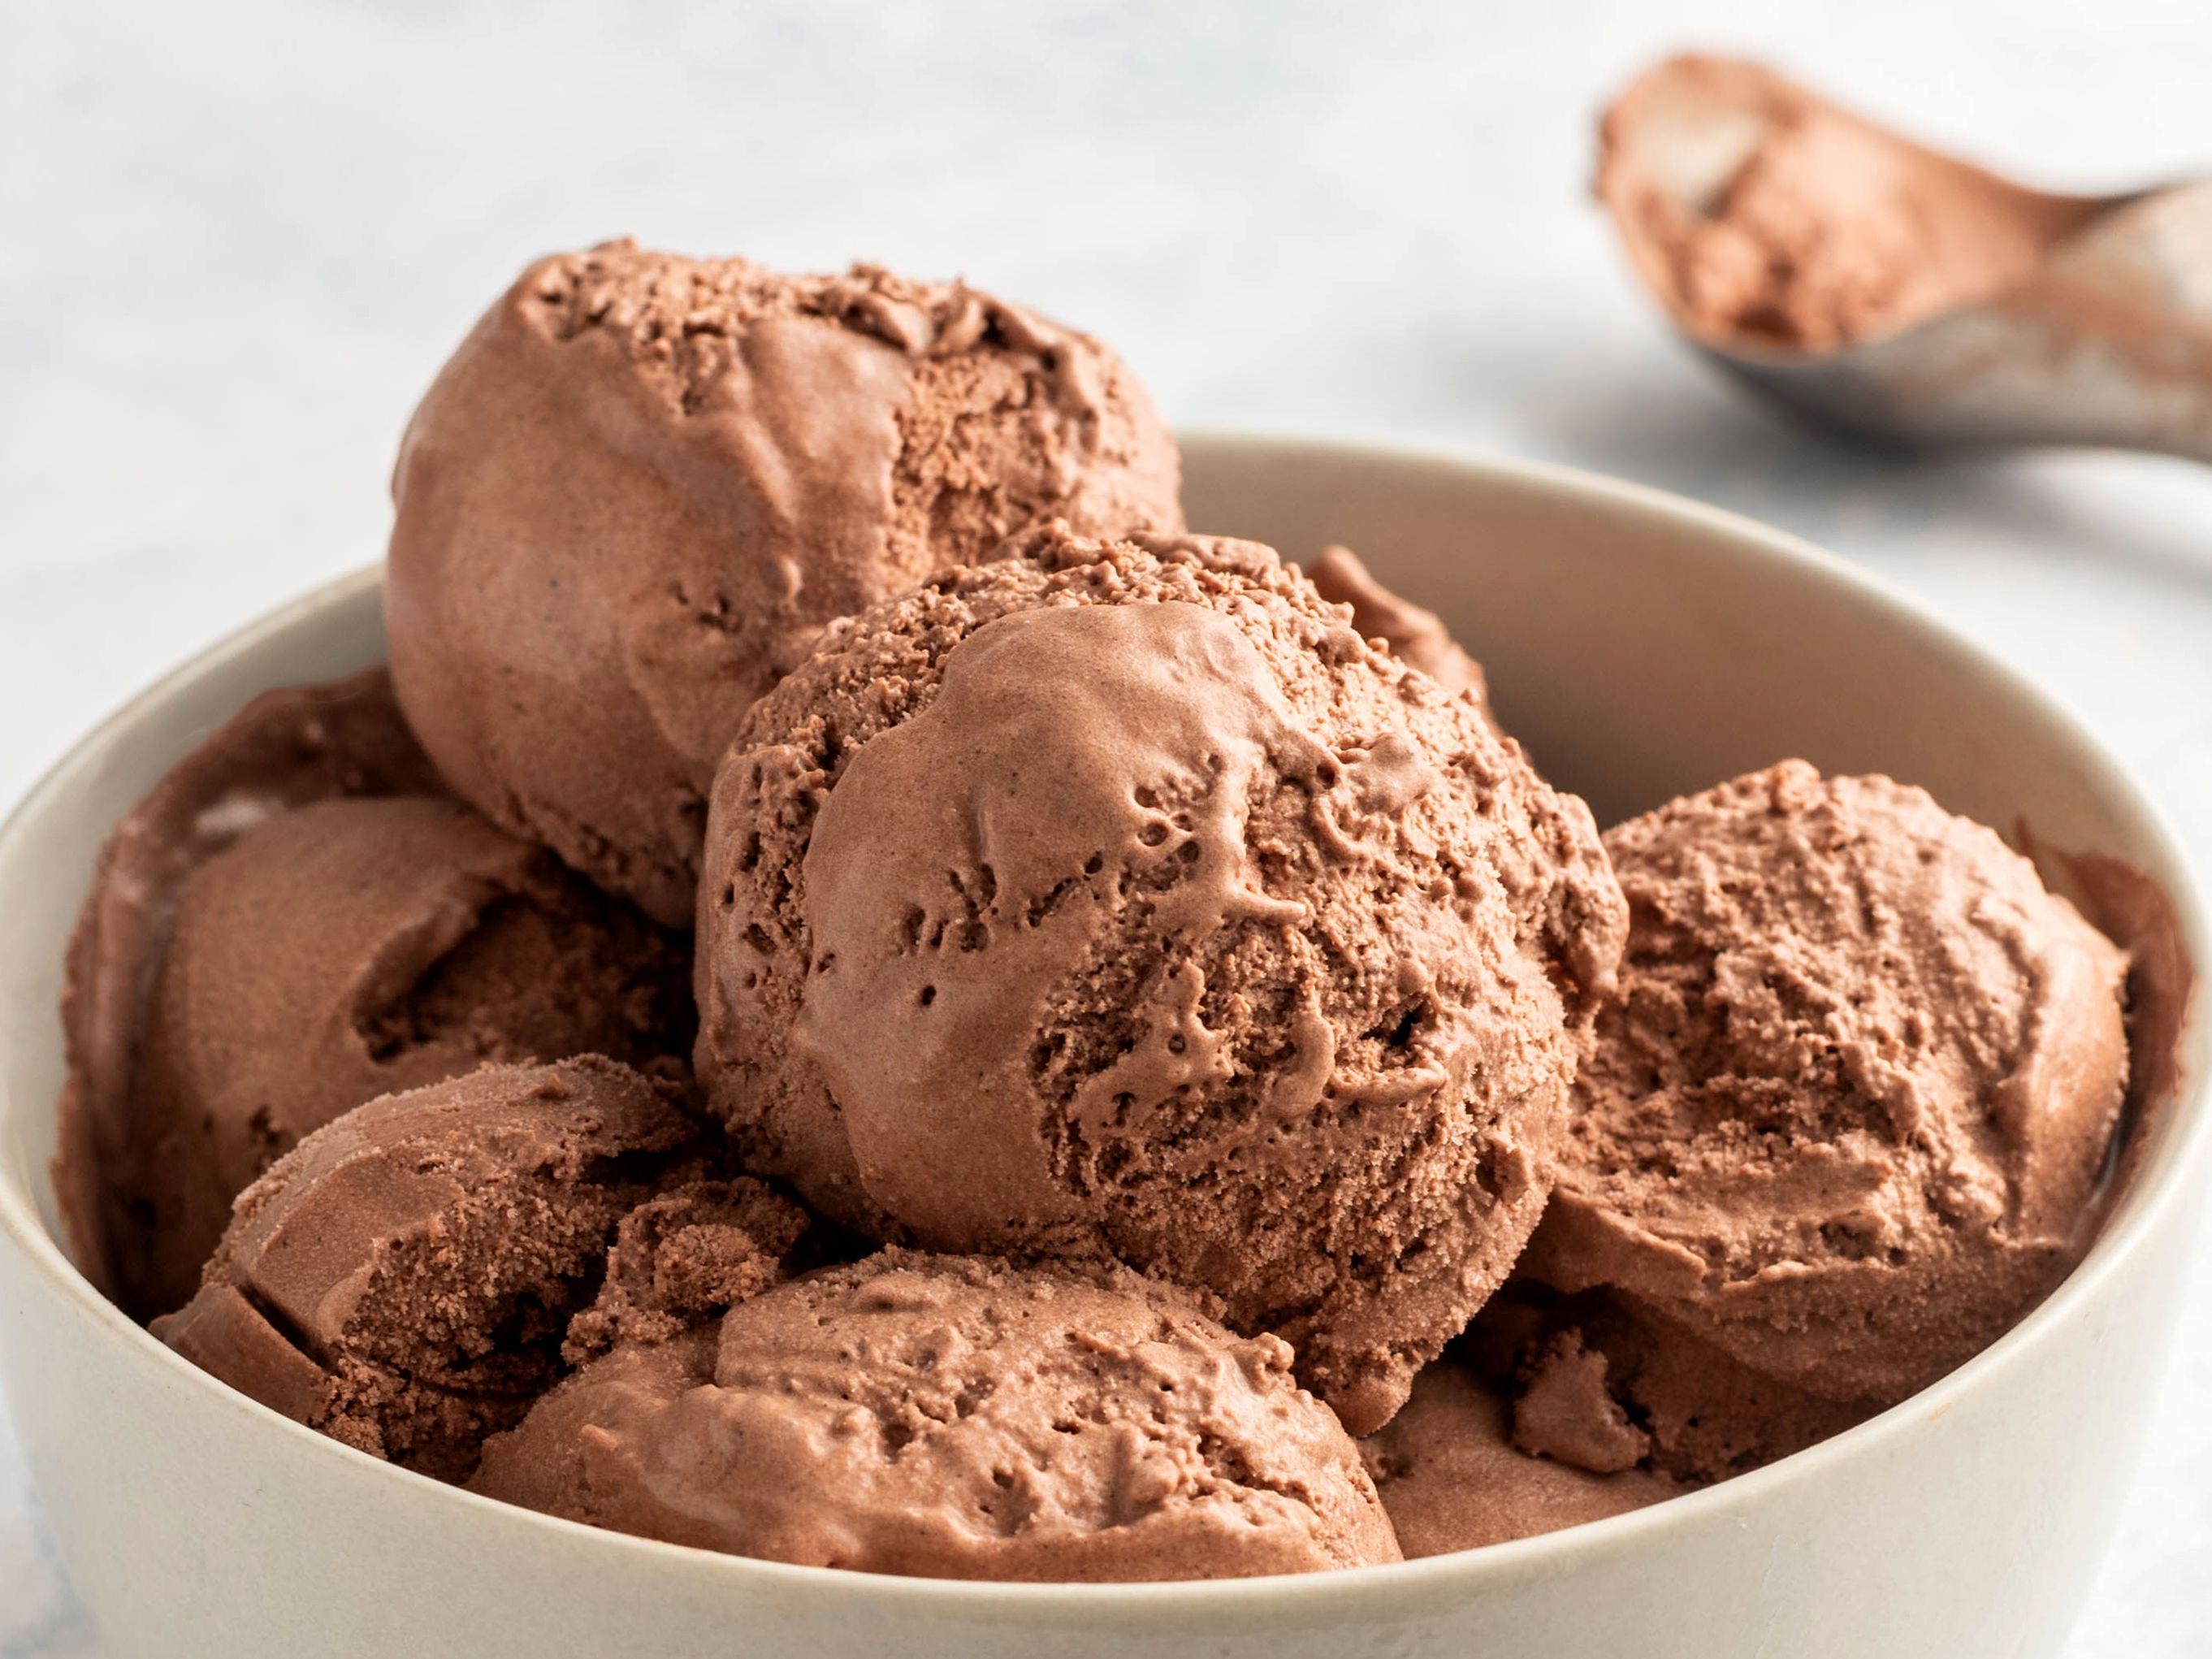 Easy No Cook Homemade Chocolate Ice Cream Recipe